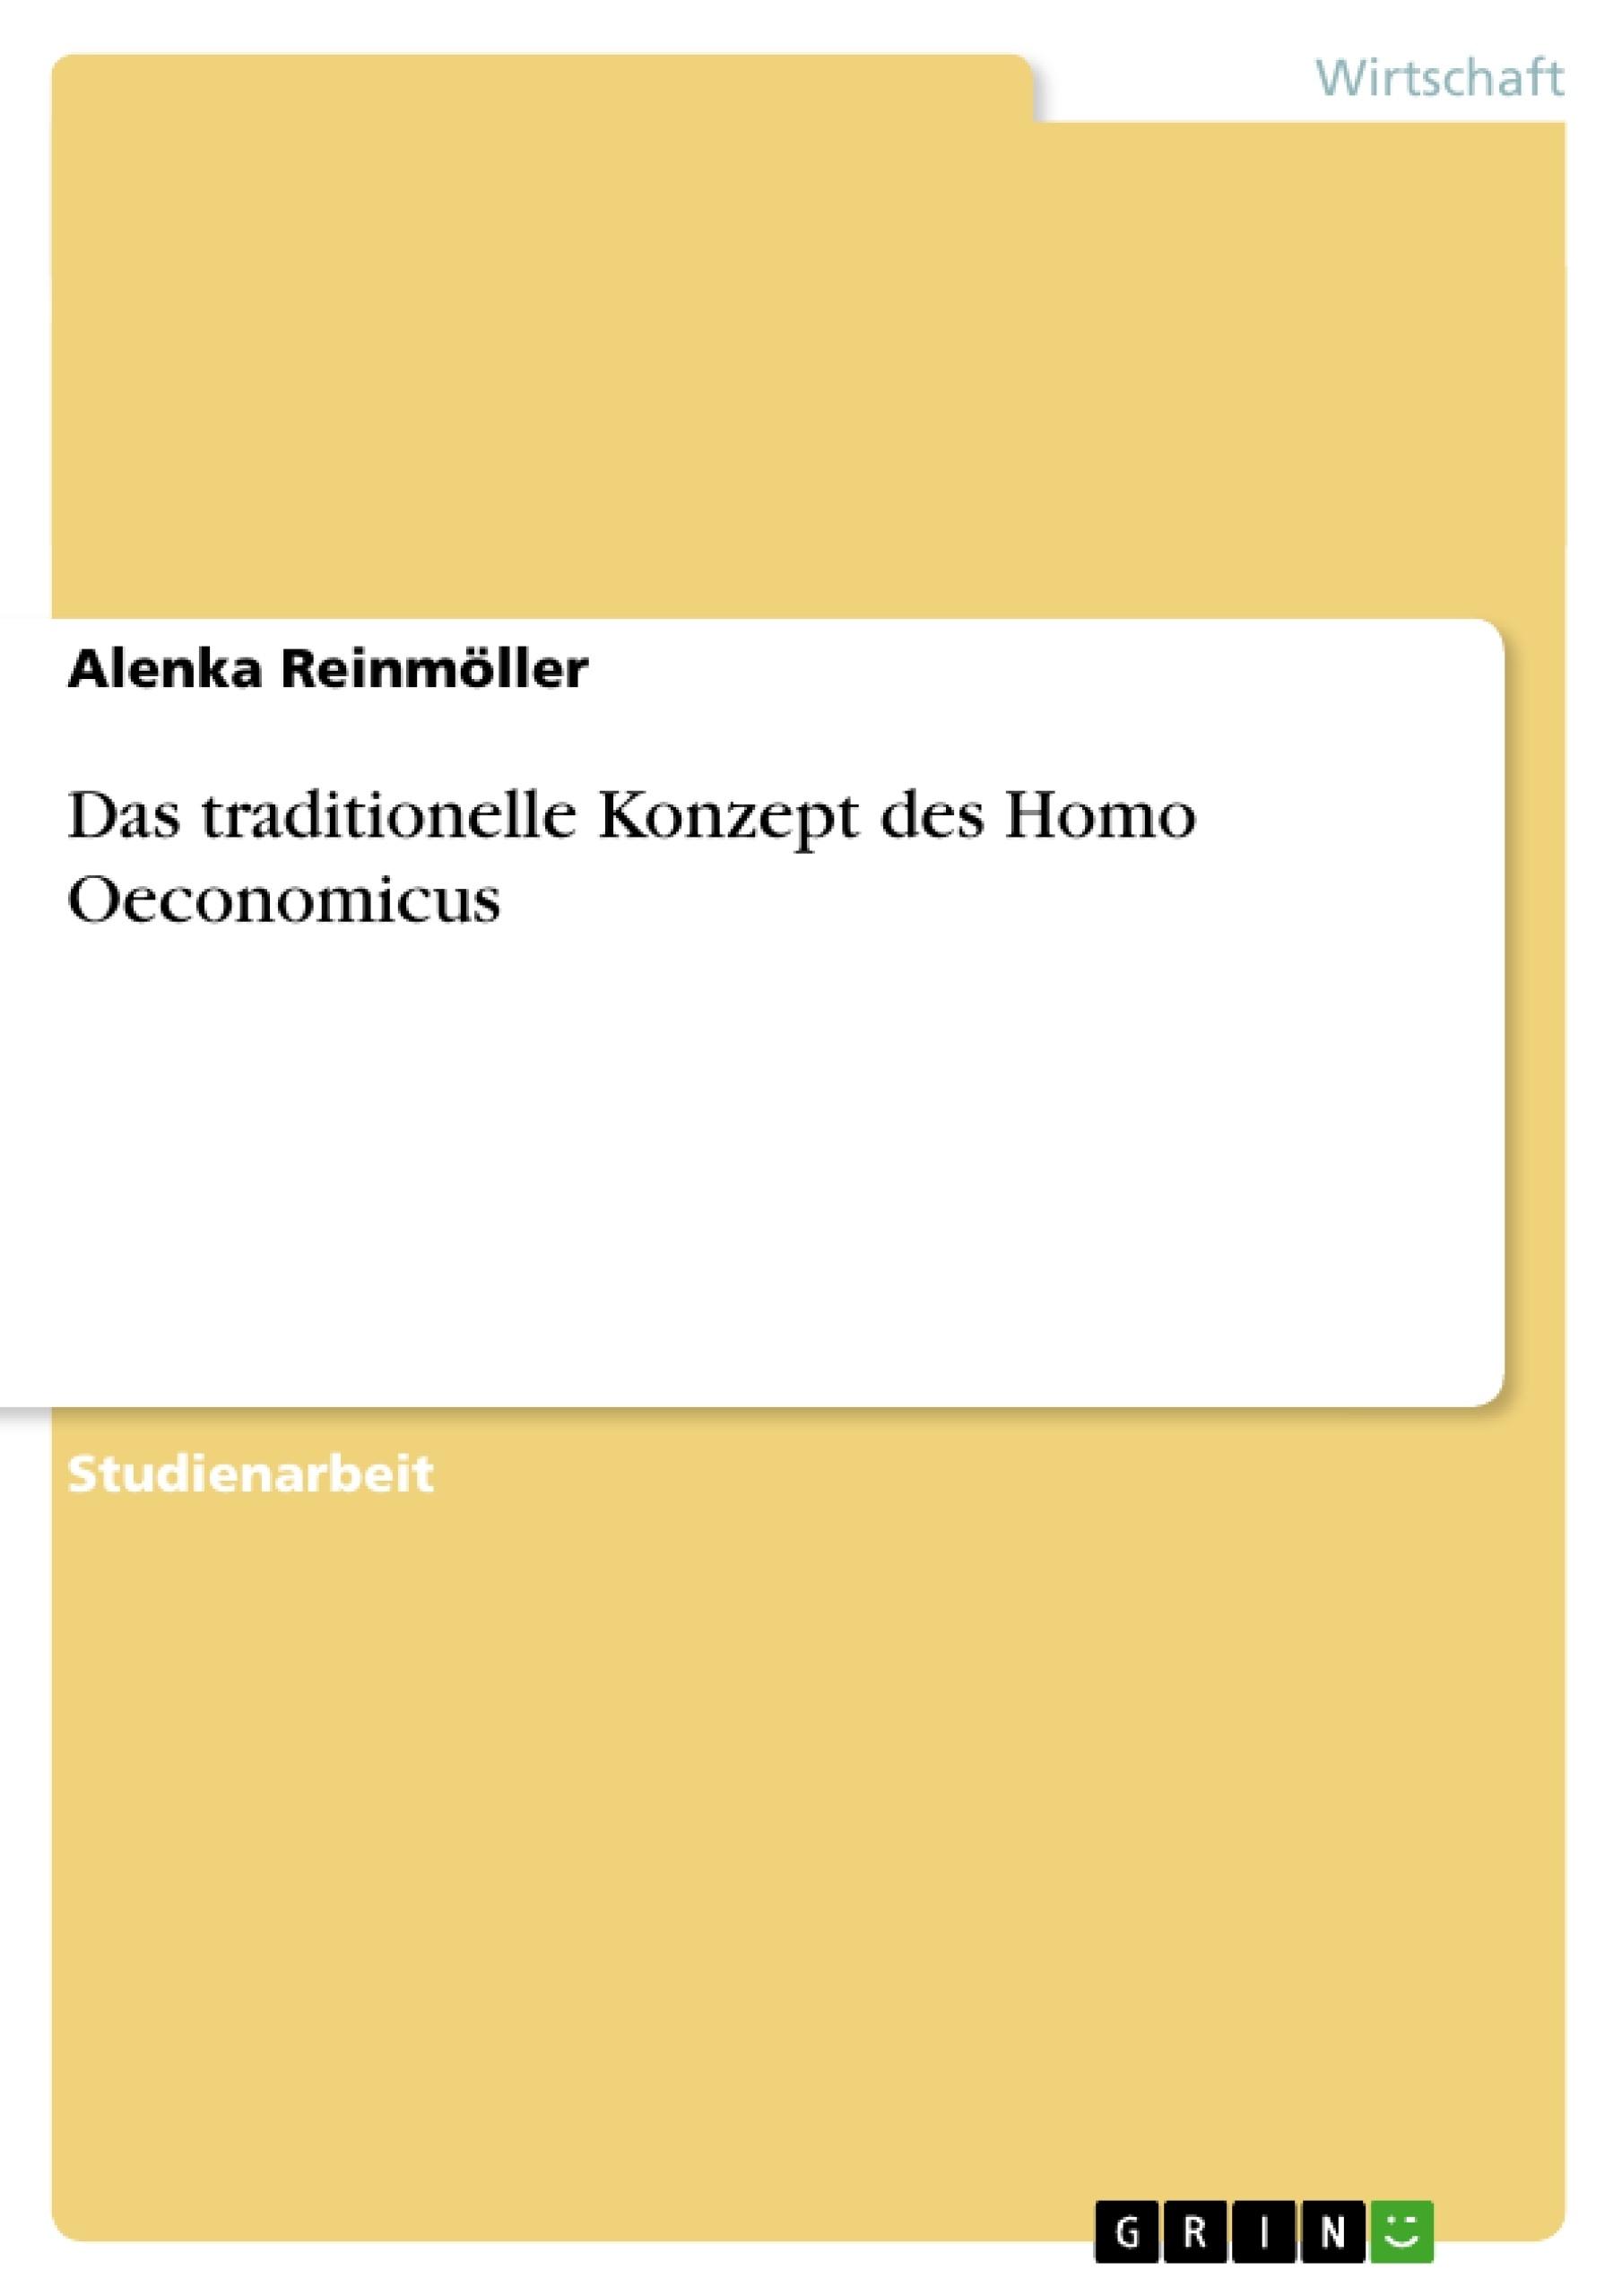 Titel: Das traditionelle Konzept des  Homo Oeconomicus